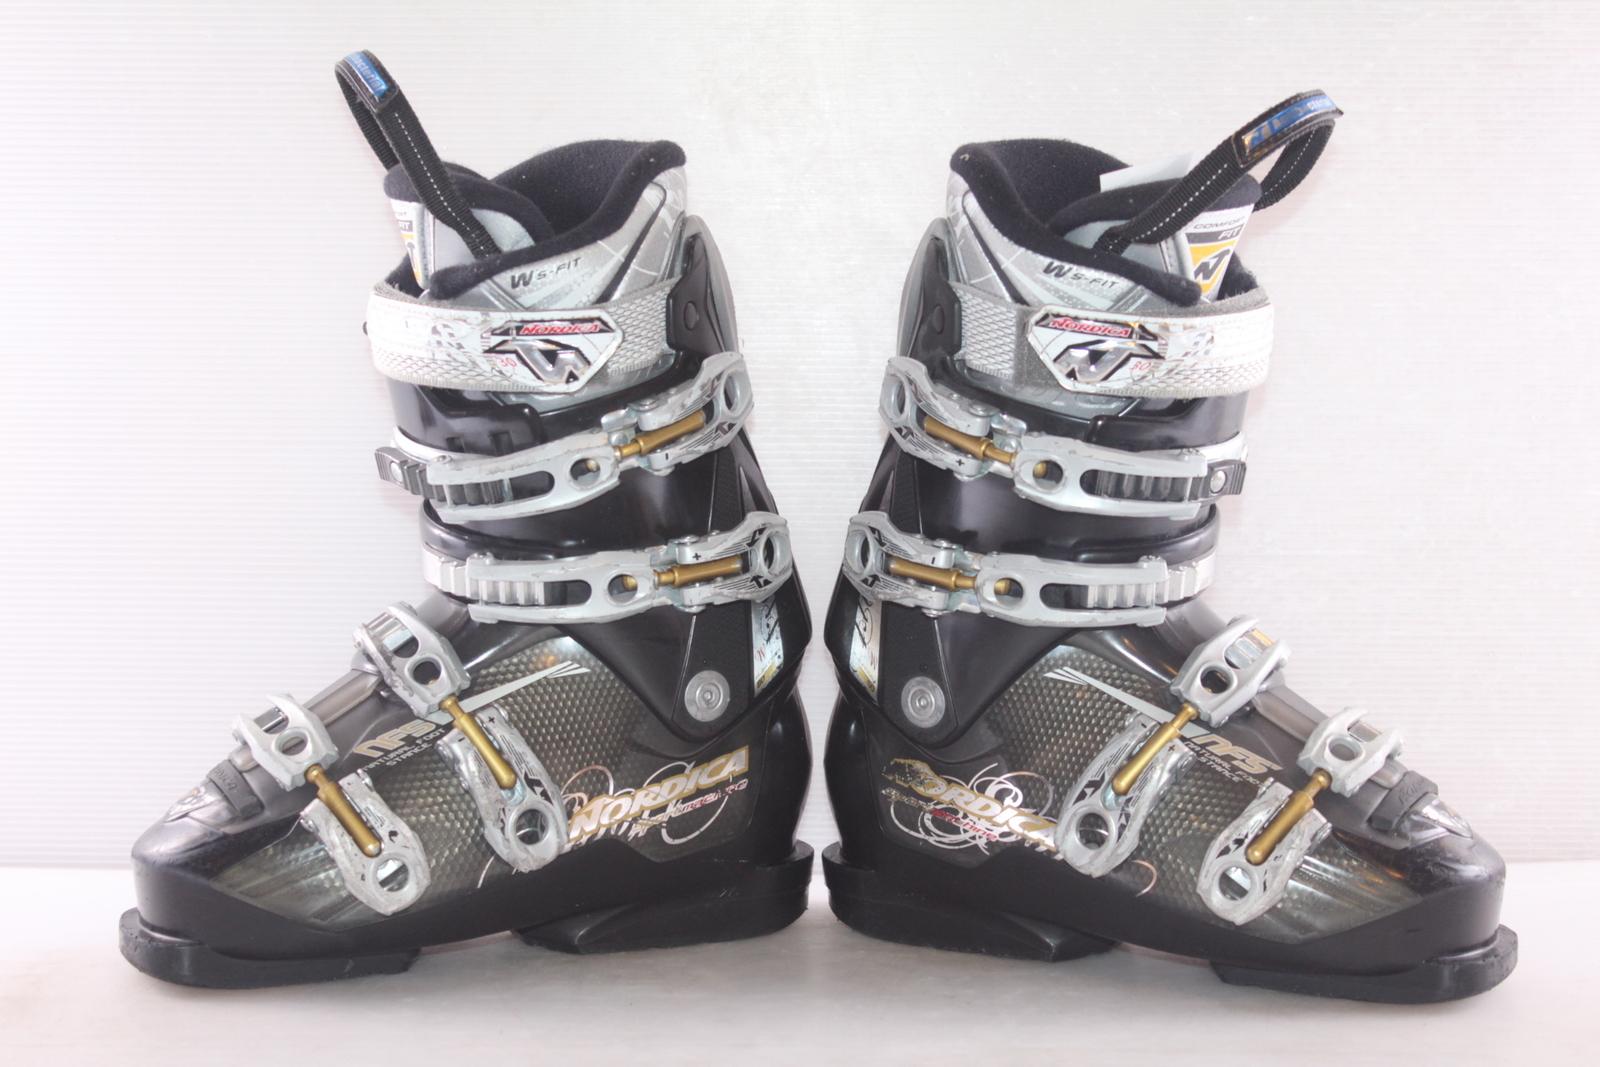 Dámské lyžáky Nordica Sport Machine NFS 80W vel. EU37 flexe 80